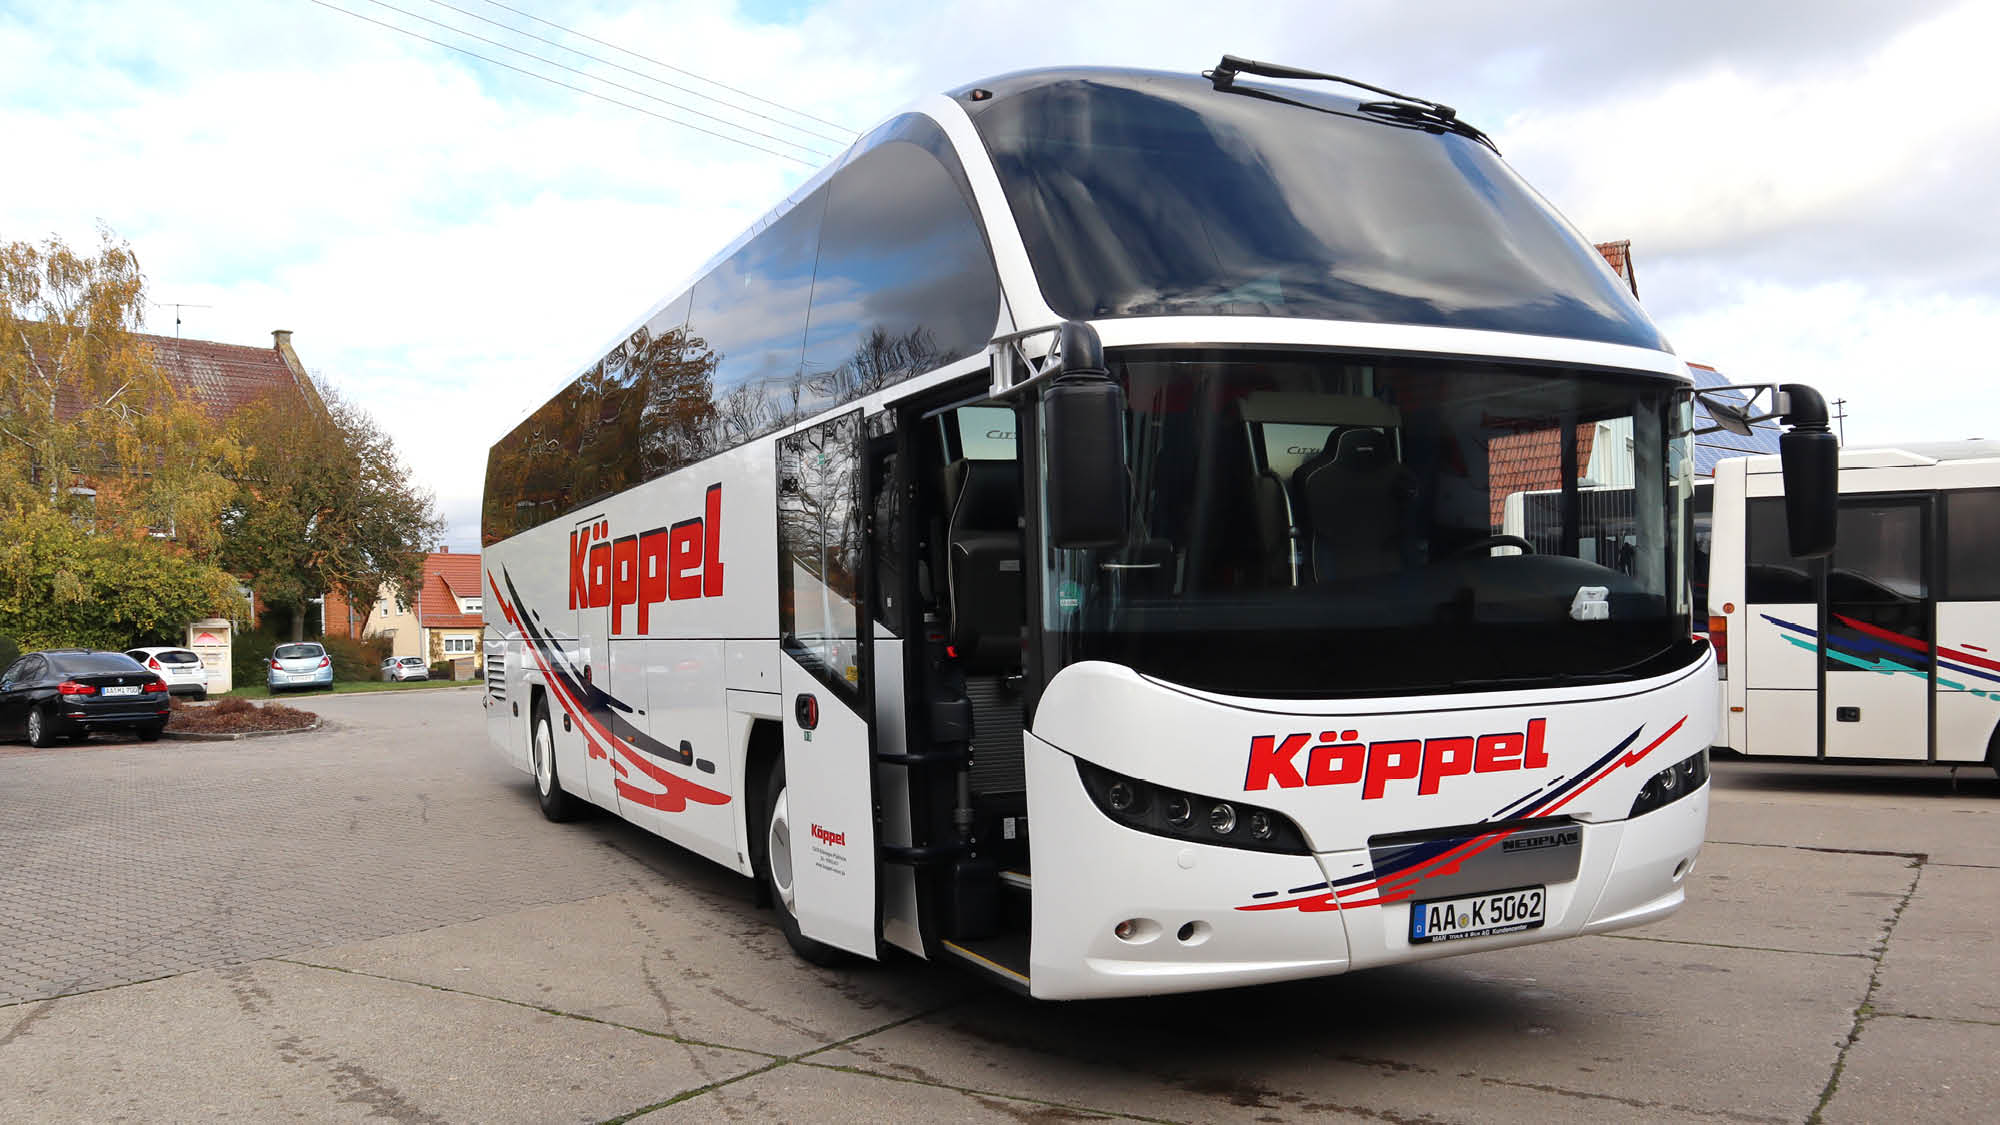 Köppel - Ellwangen - Website - Bus - 2019-12 - 11